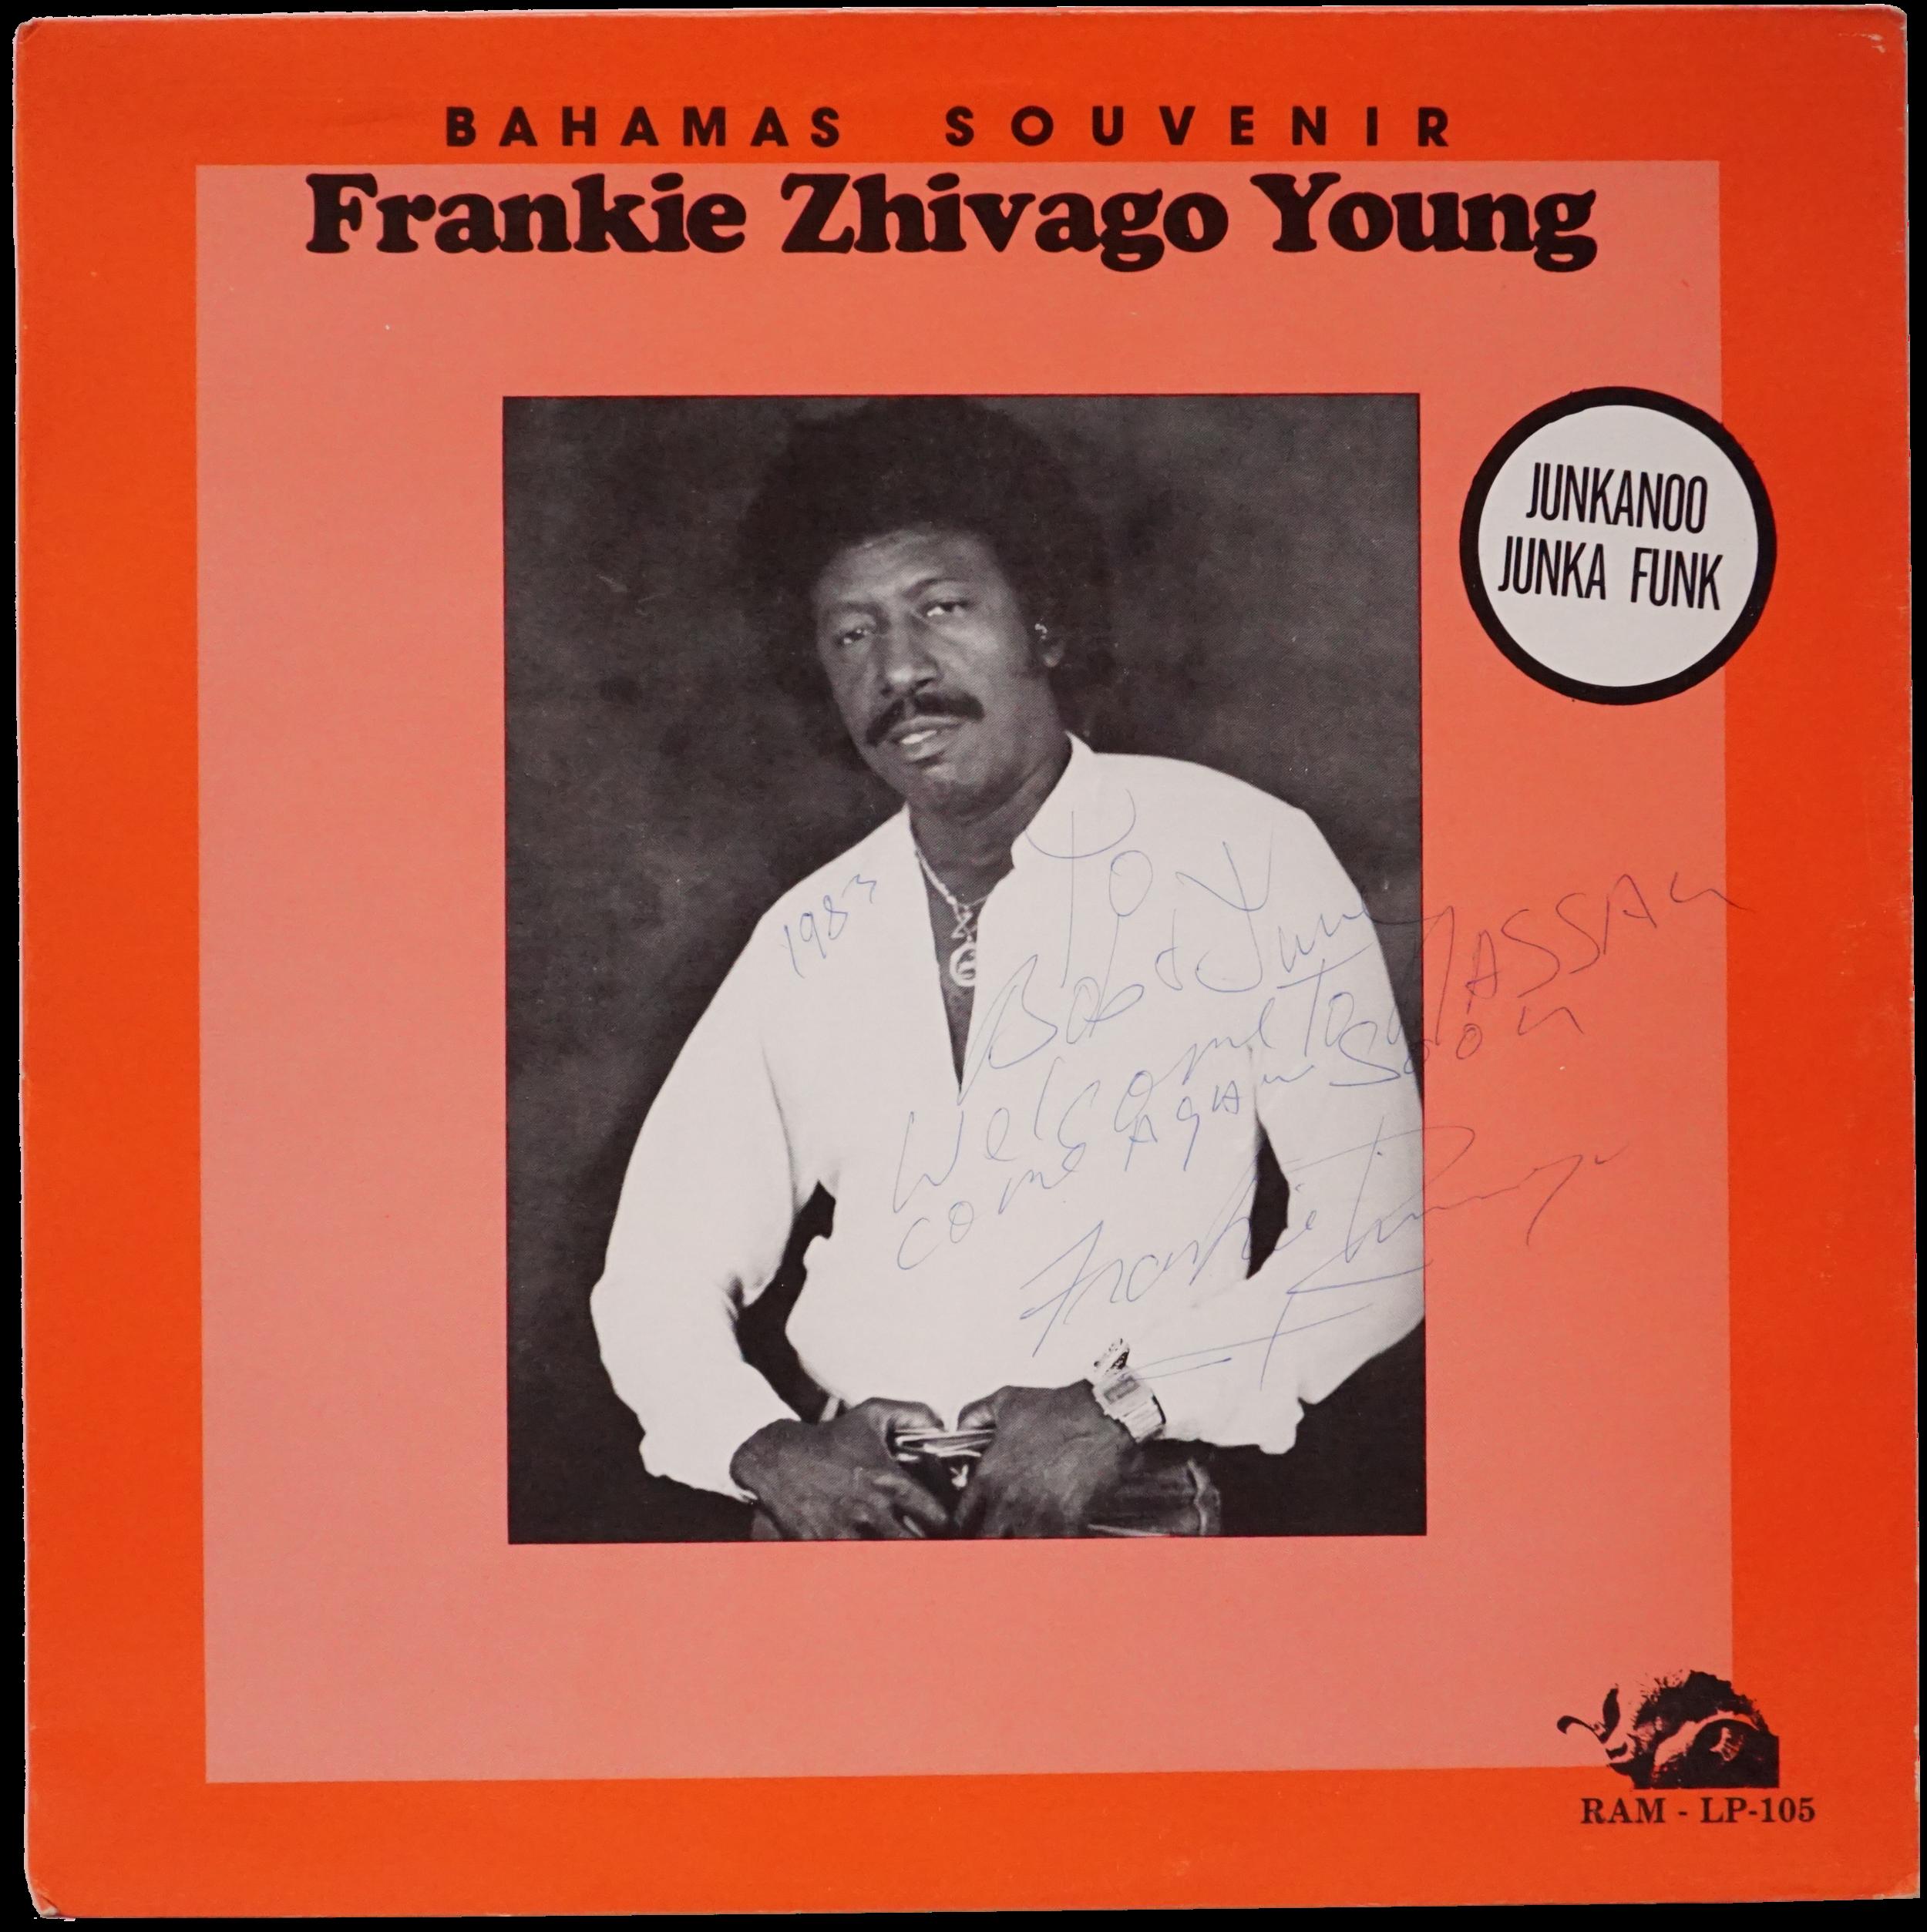 WLWLTDOO-XXXX-12-FRANKIE_ZHIVAGO_YOUNG-BAHAMAS_SOUVENIR-FRONT-LP105.png